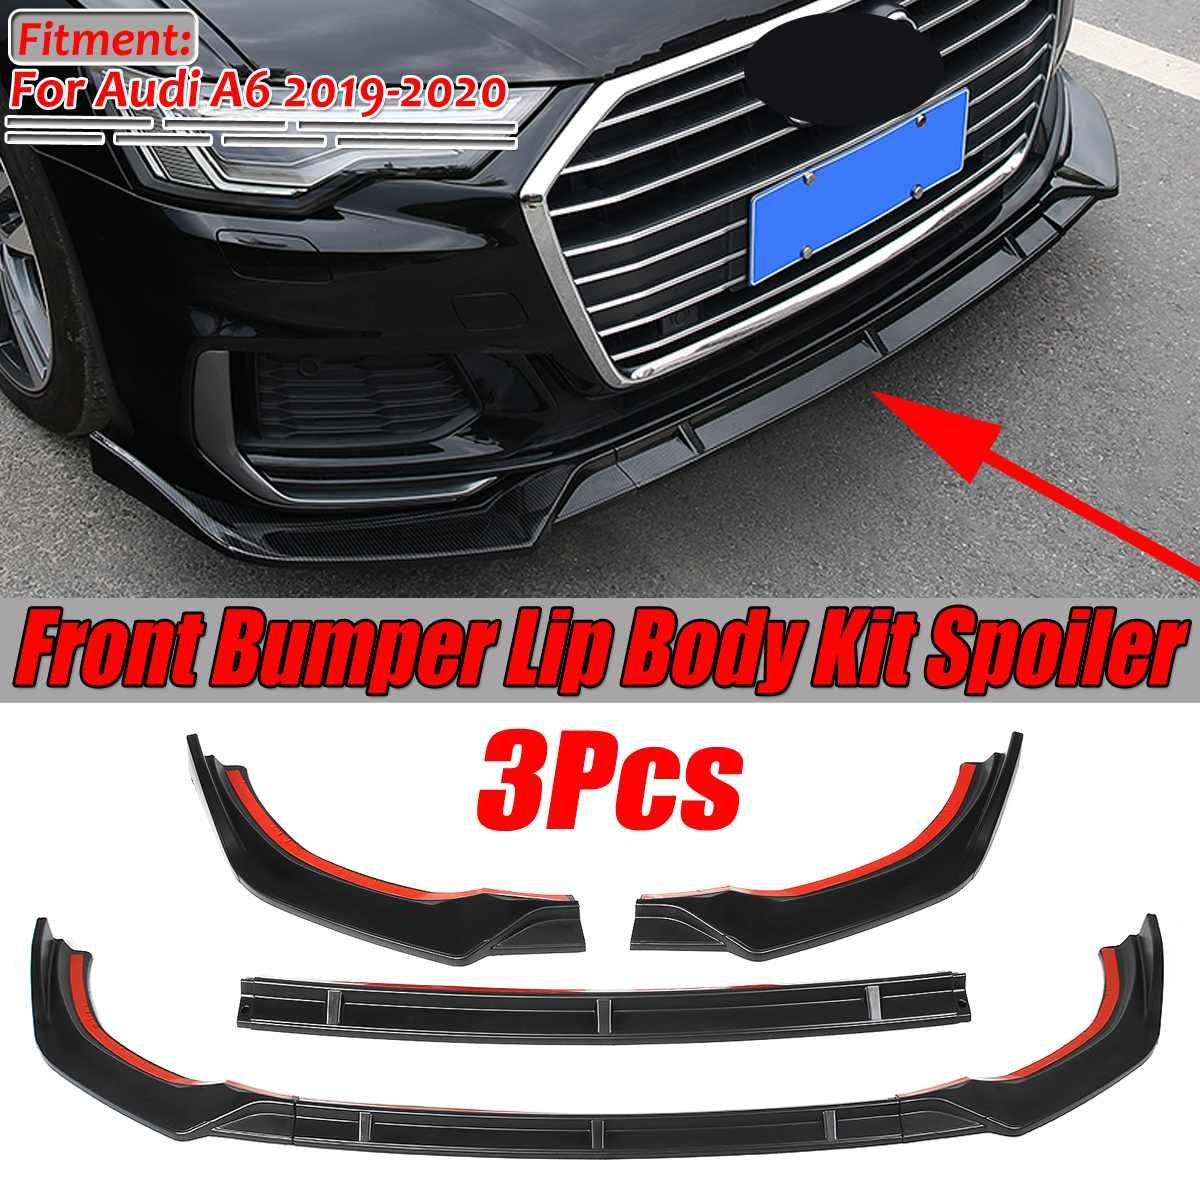 3Pcs For 2016-2018 Audi A6 Sport Carbon Fiber Front Bumper Lip Body Kit Spoiler